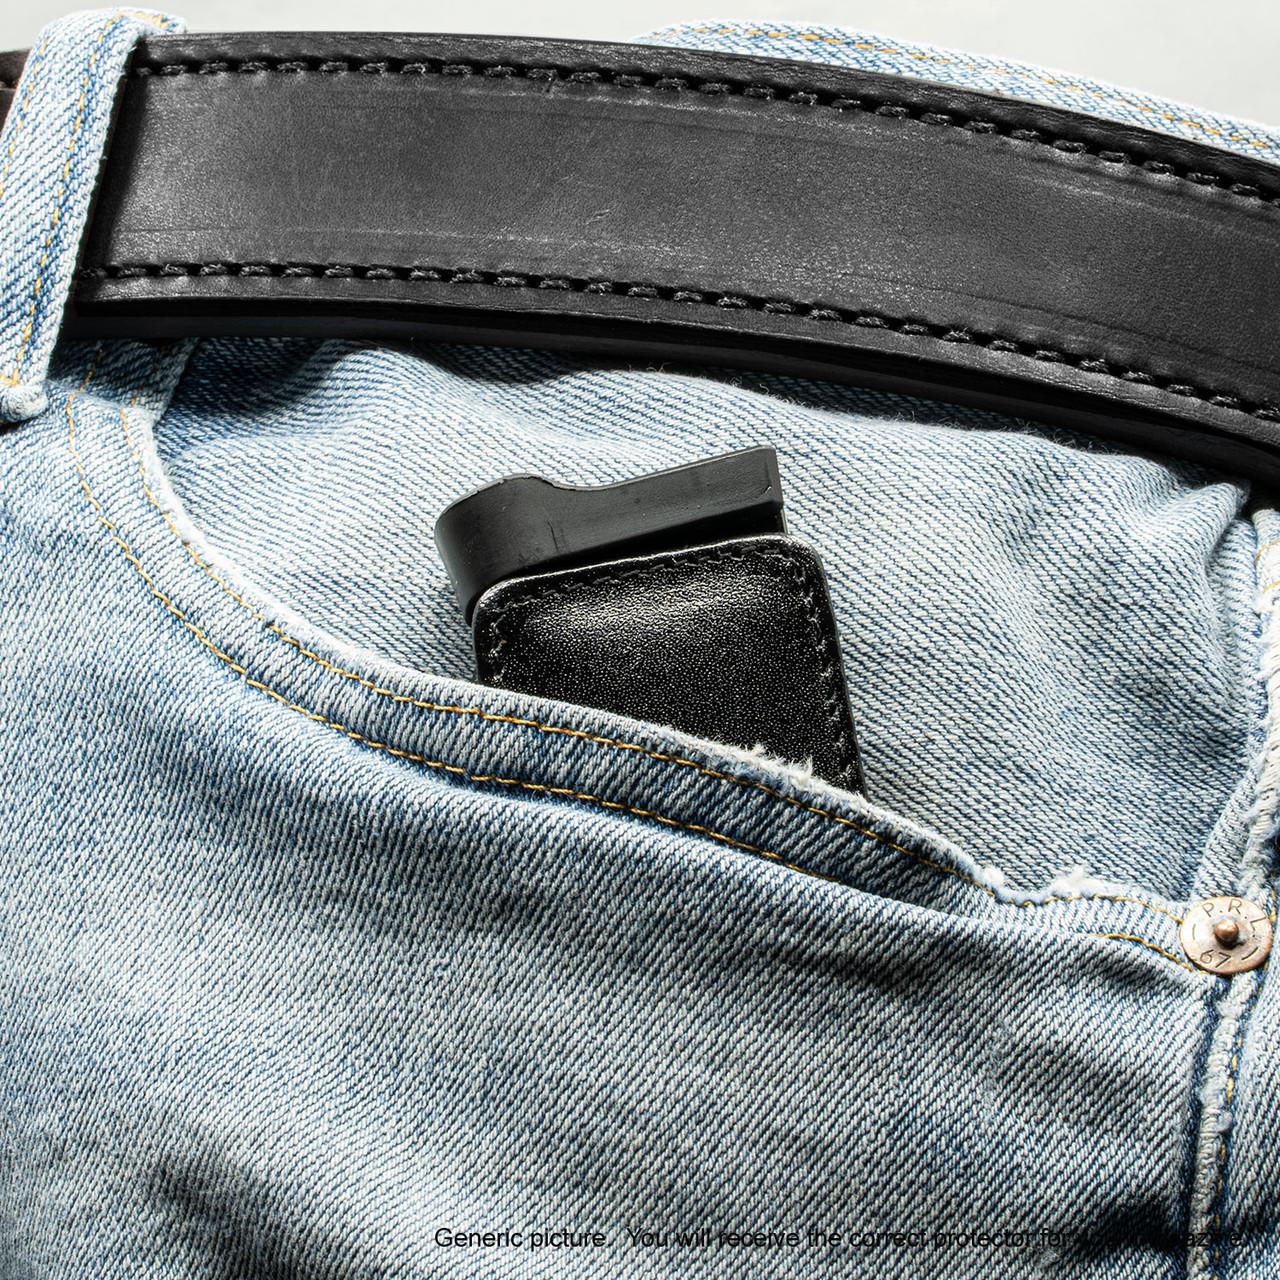 Glock 26 Black Leather Magazine Pocket Protector